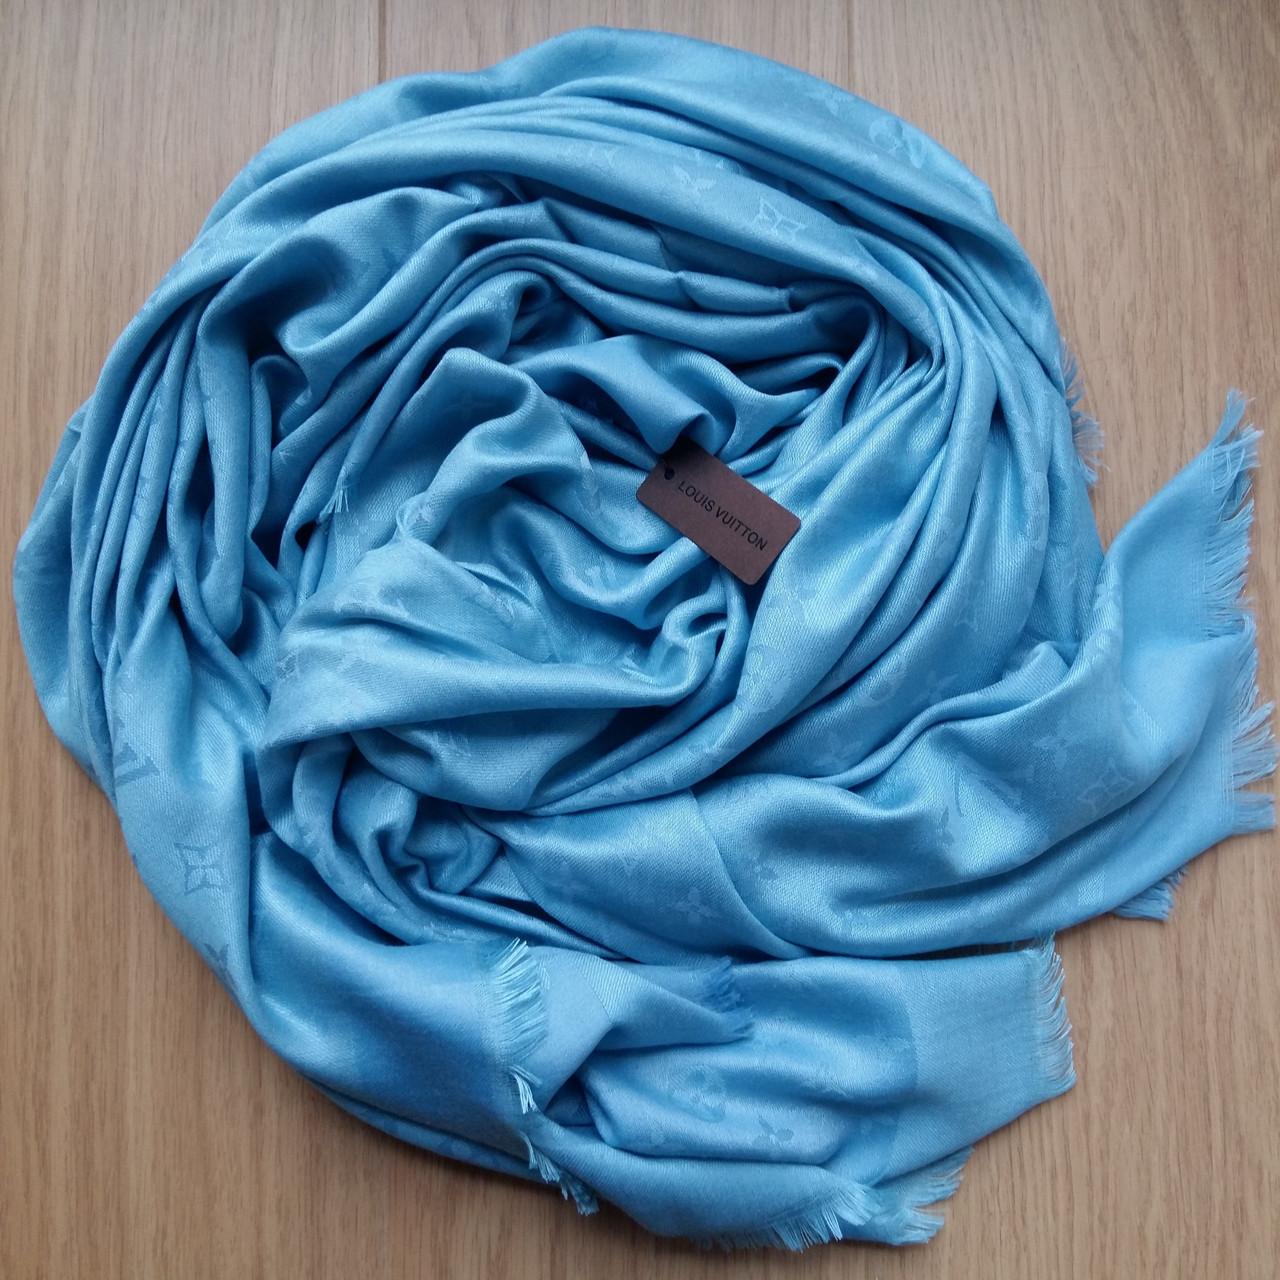 Платок Louis Vuitton голубой